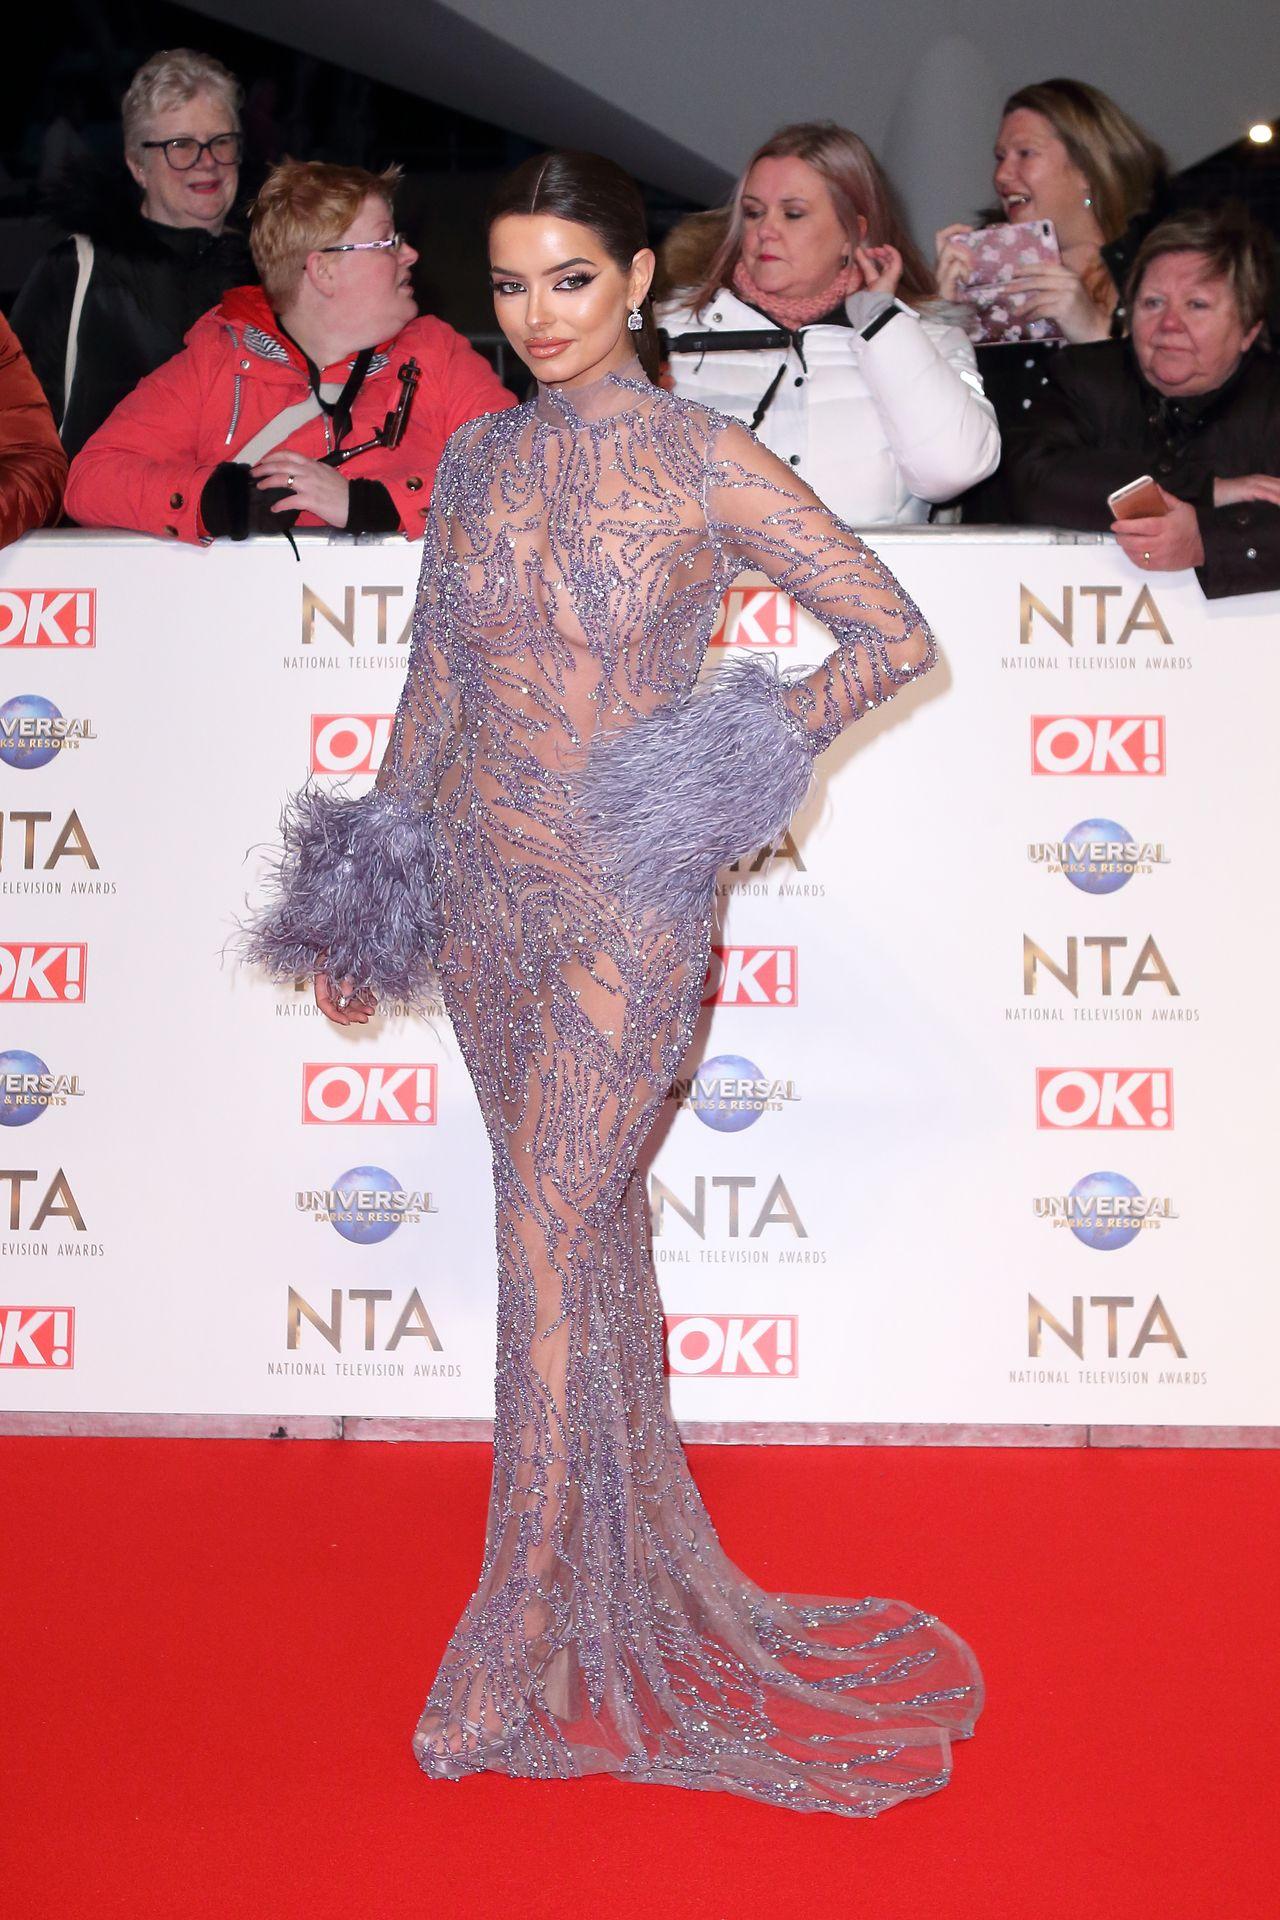 Maura Higgins Looks Hot At The National Television Awards 0015